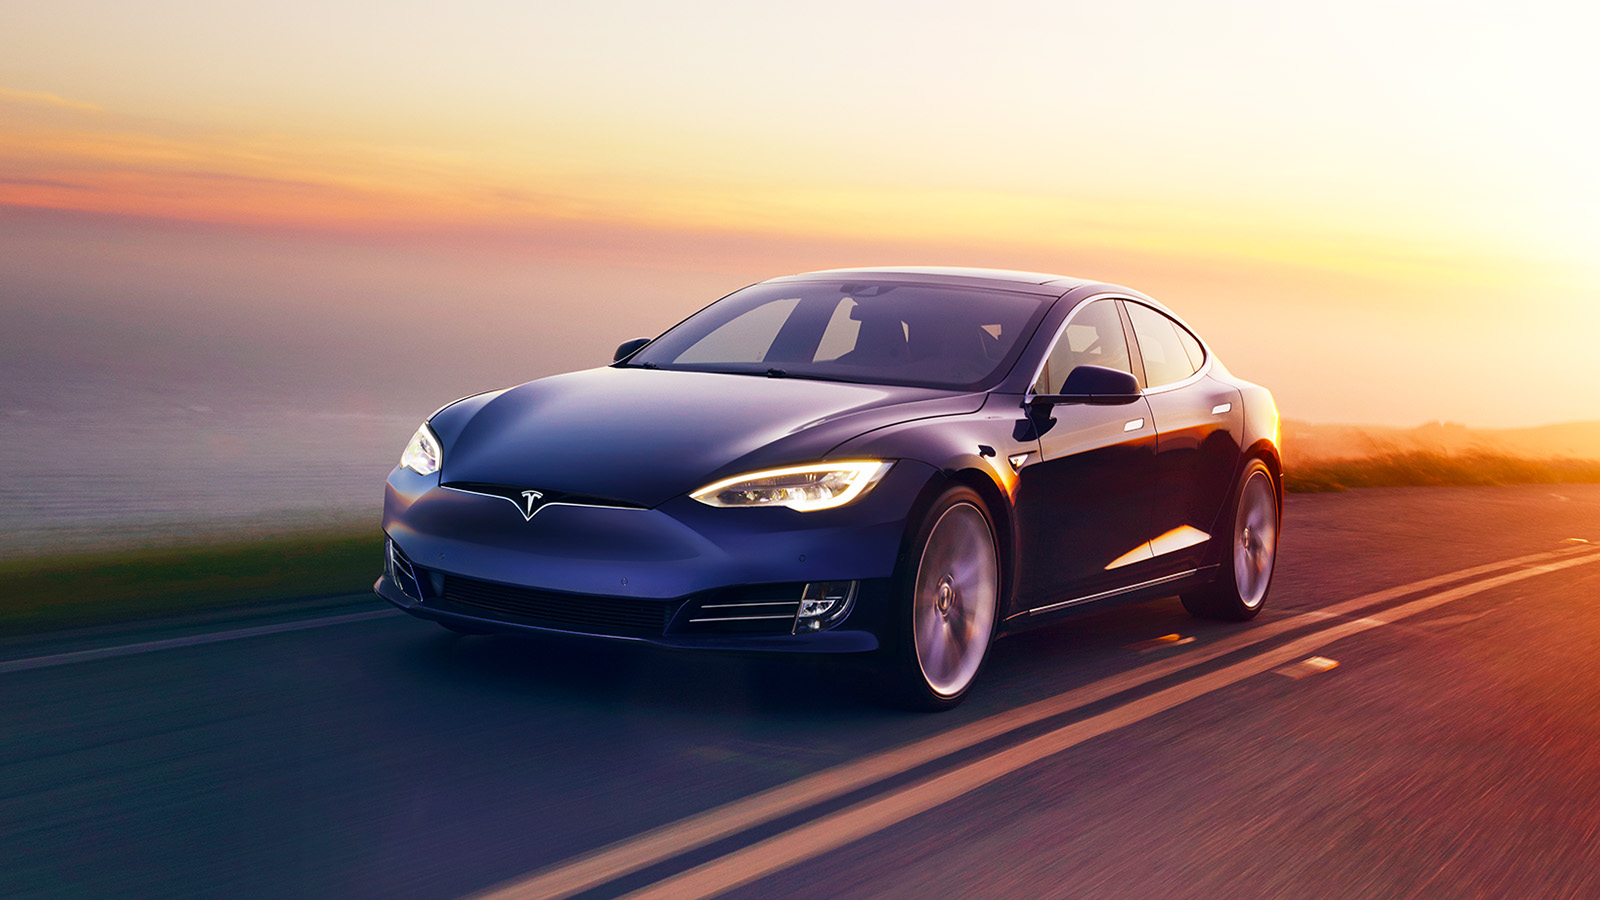 Tesla Model S Sunset